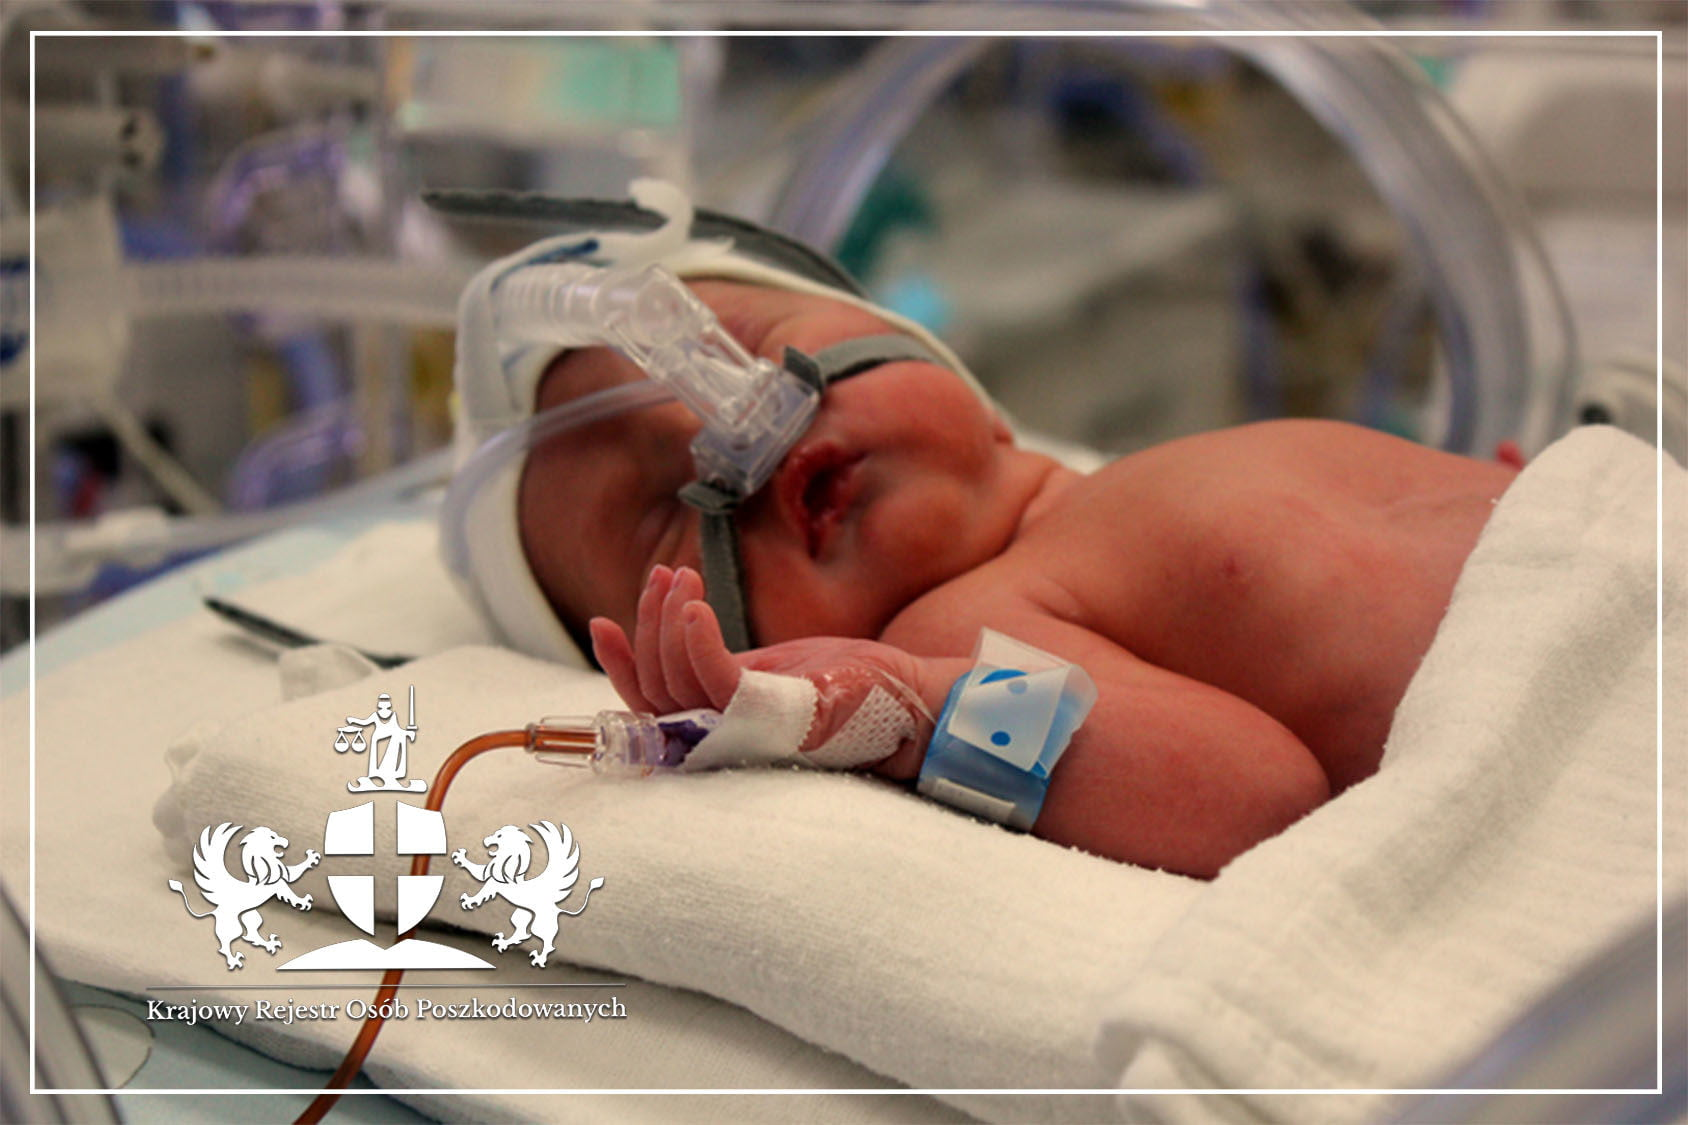 Nadciśnienie płucne u noworodka